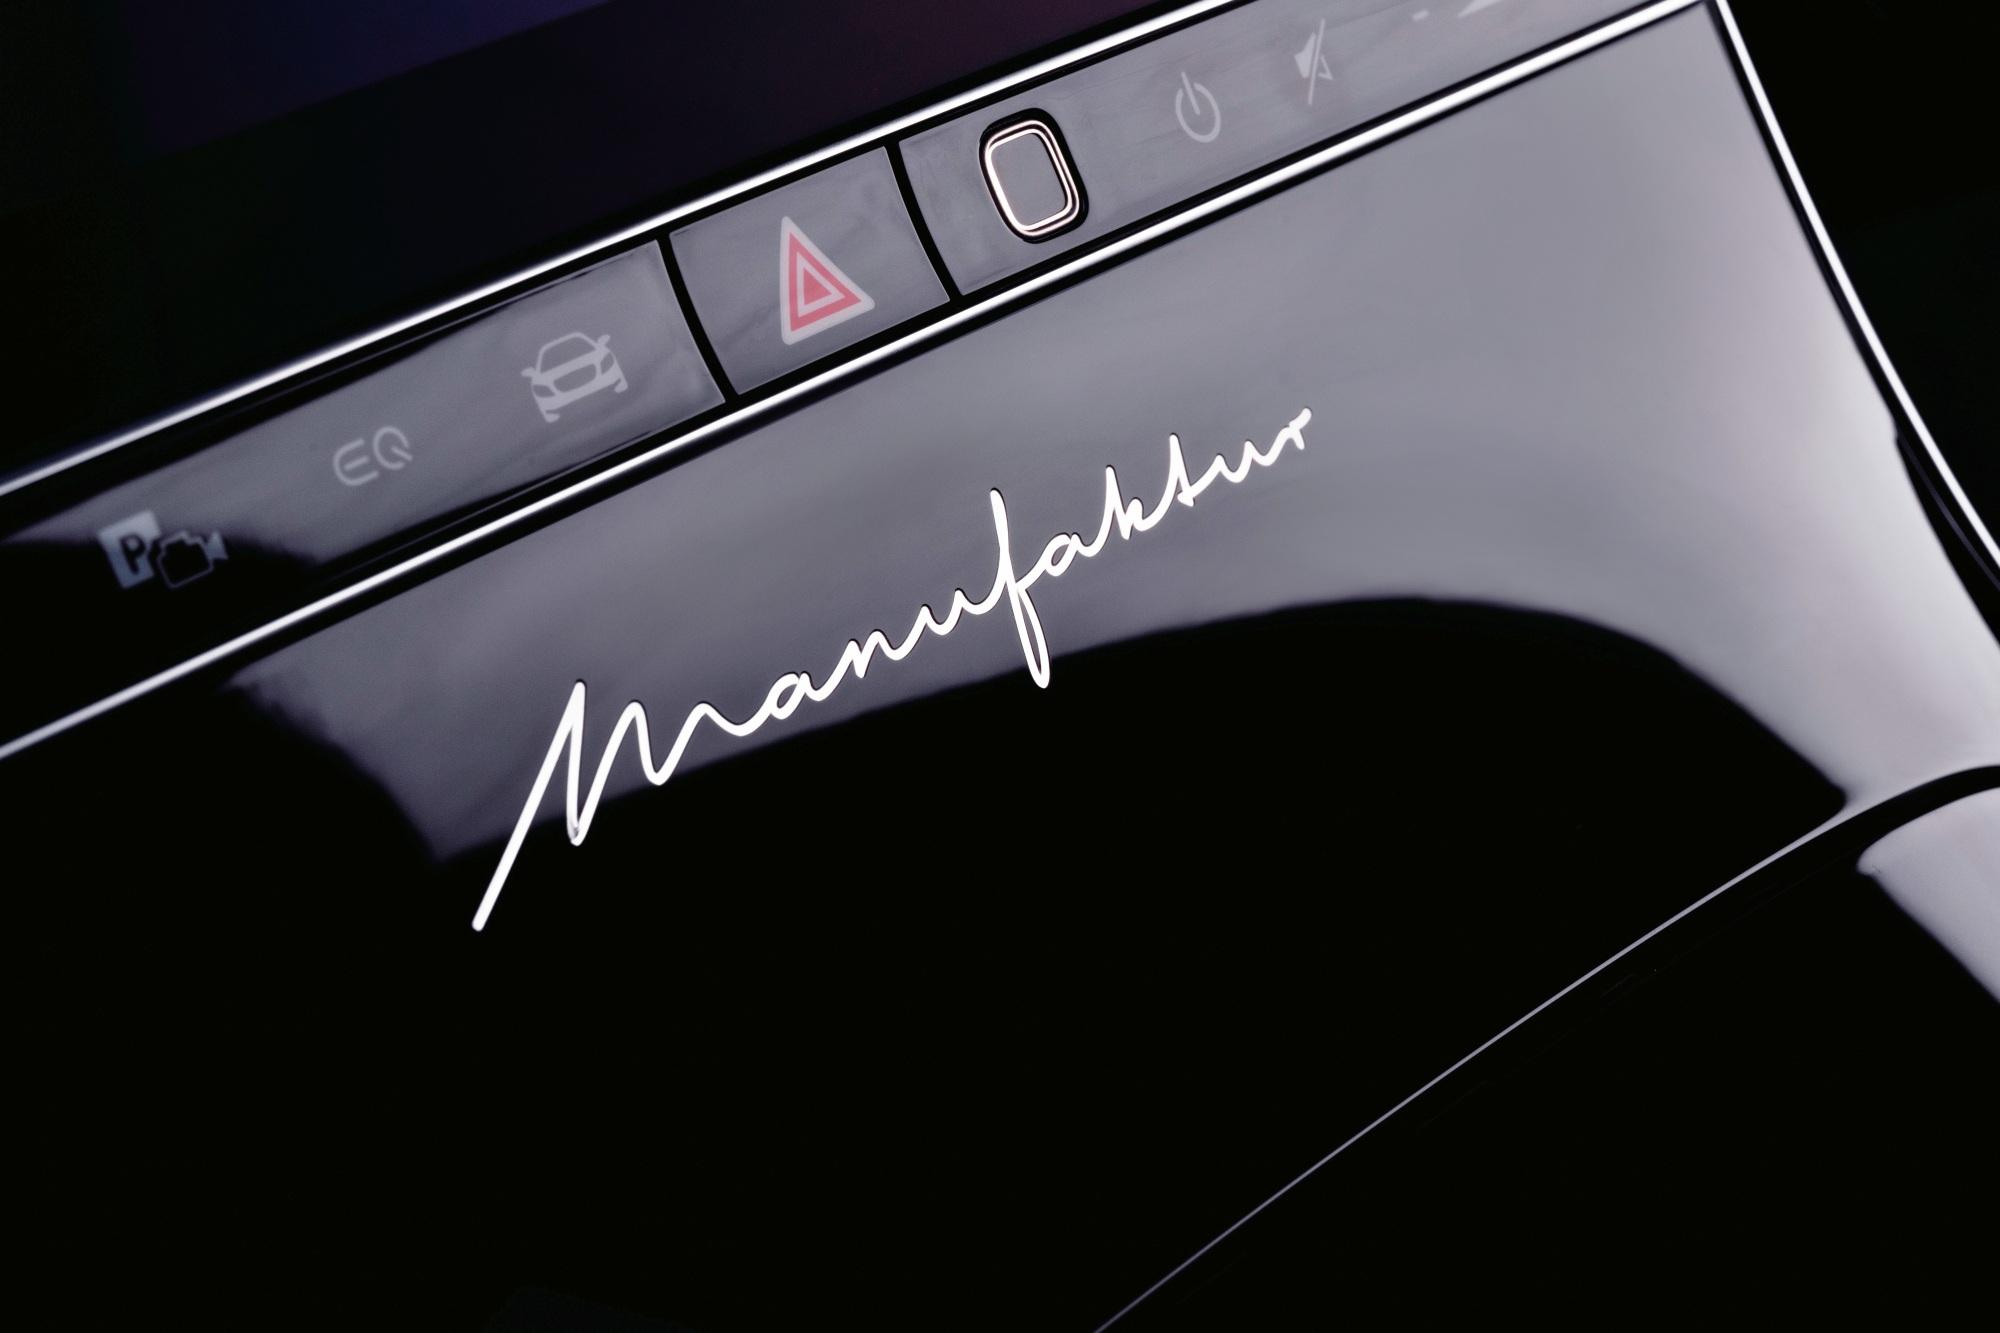 Mercedes klasy S wnętrze